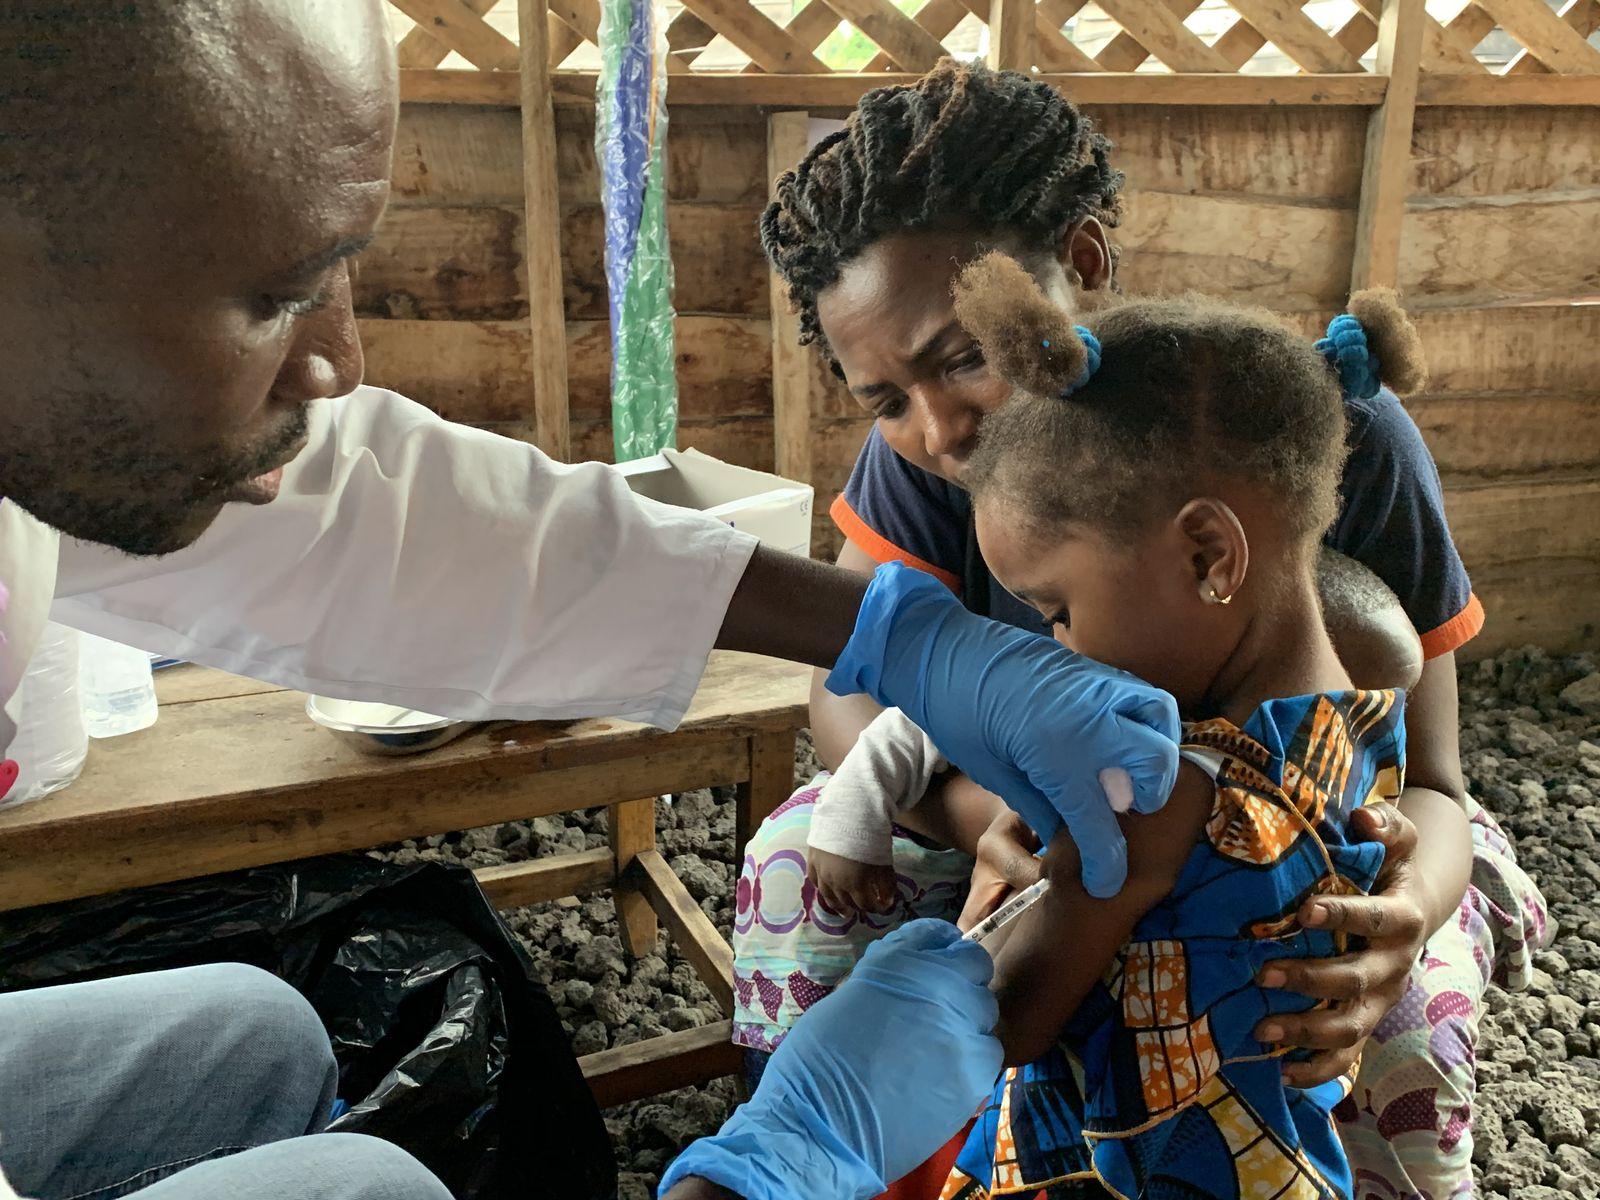 Over 6,000 deaths in measles outbreak in Democratic Republic of the Congo, Goma, Congo The Democratic Republic Of The - 12 Dec 2019